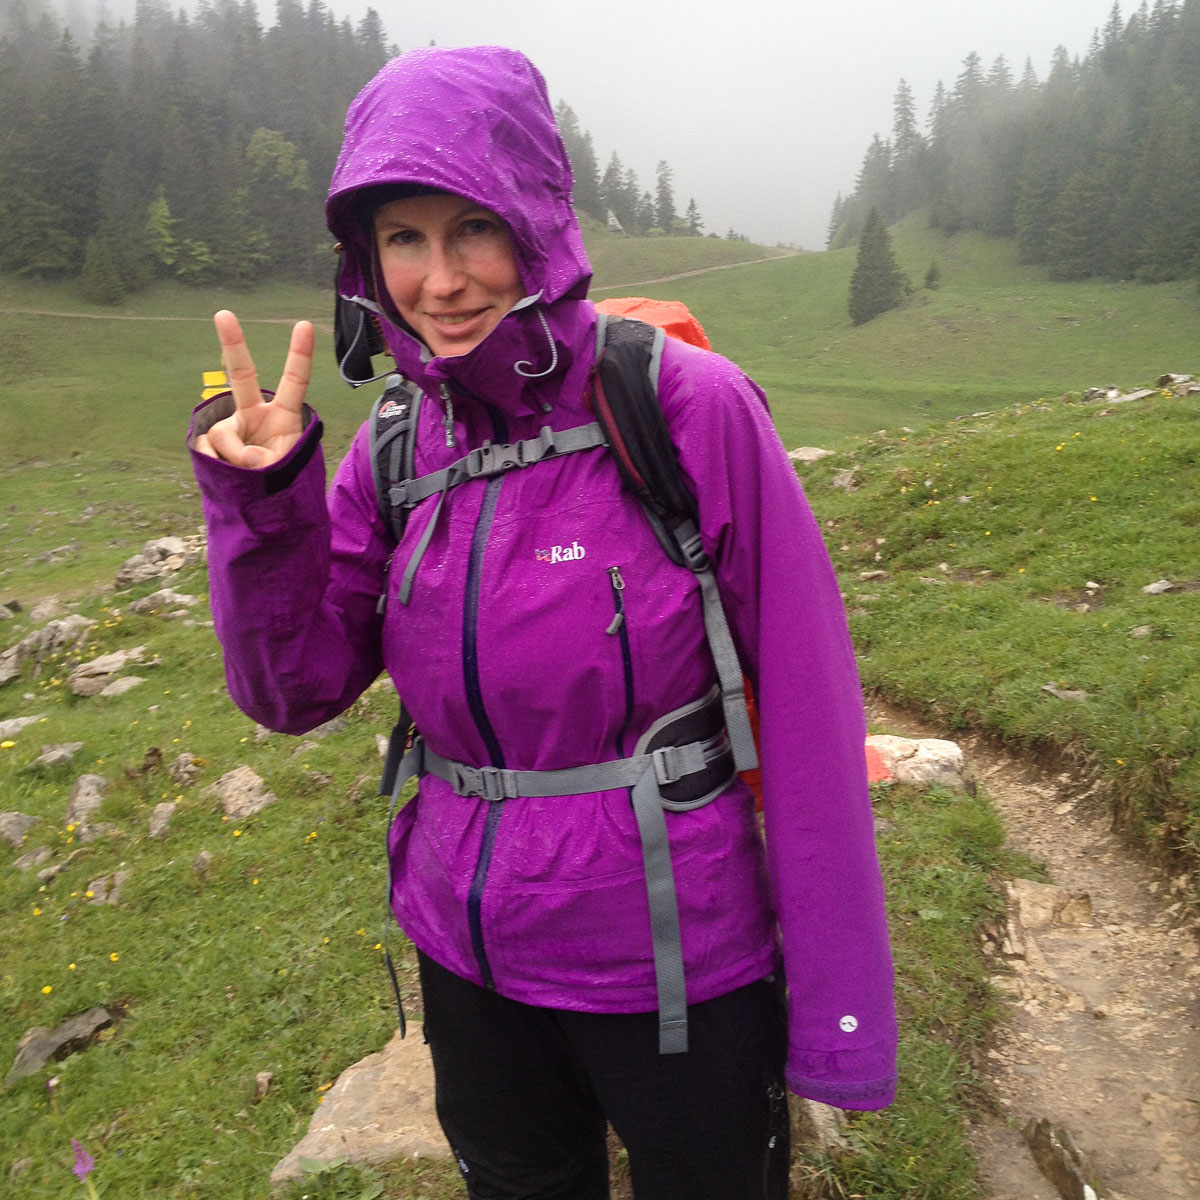 Artikelbild Spitzingsee Brecherspitze Regenbekleidung